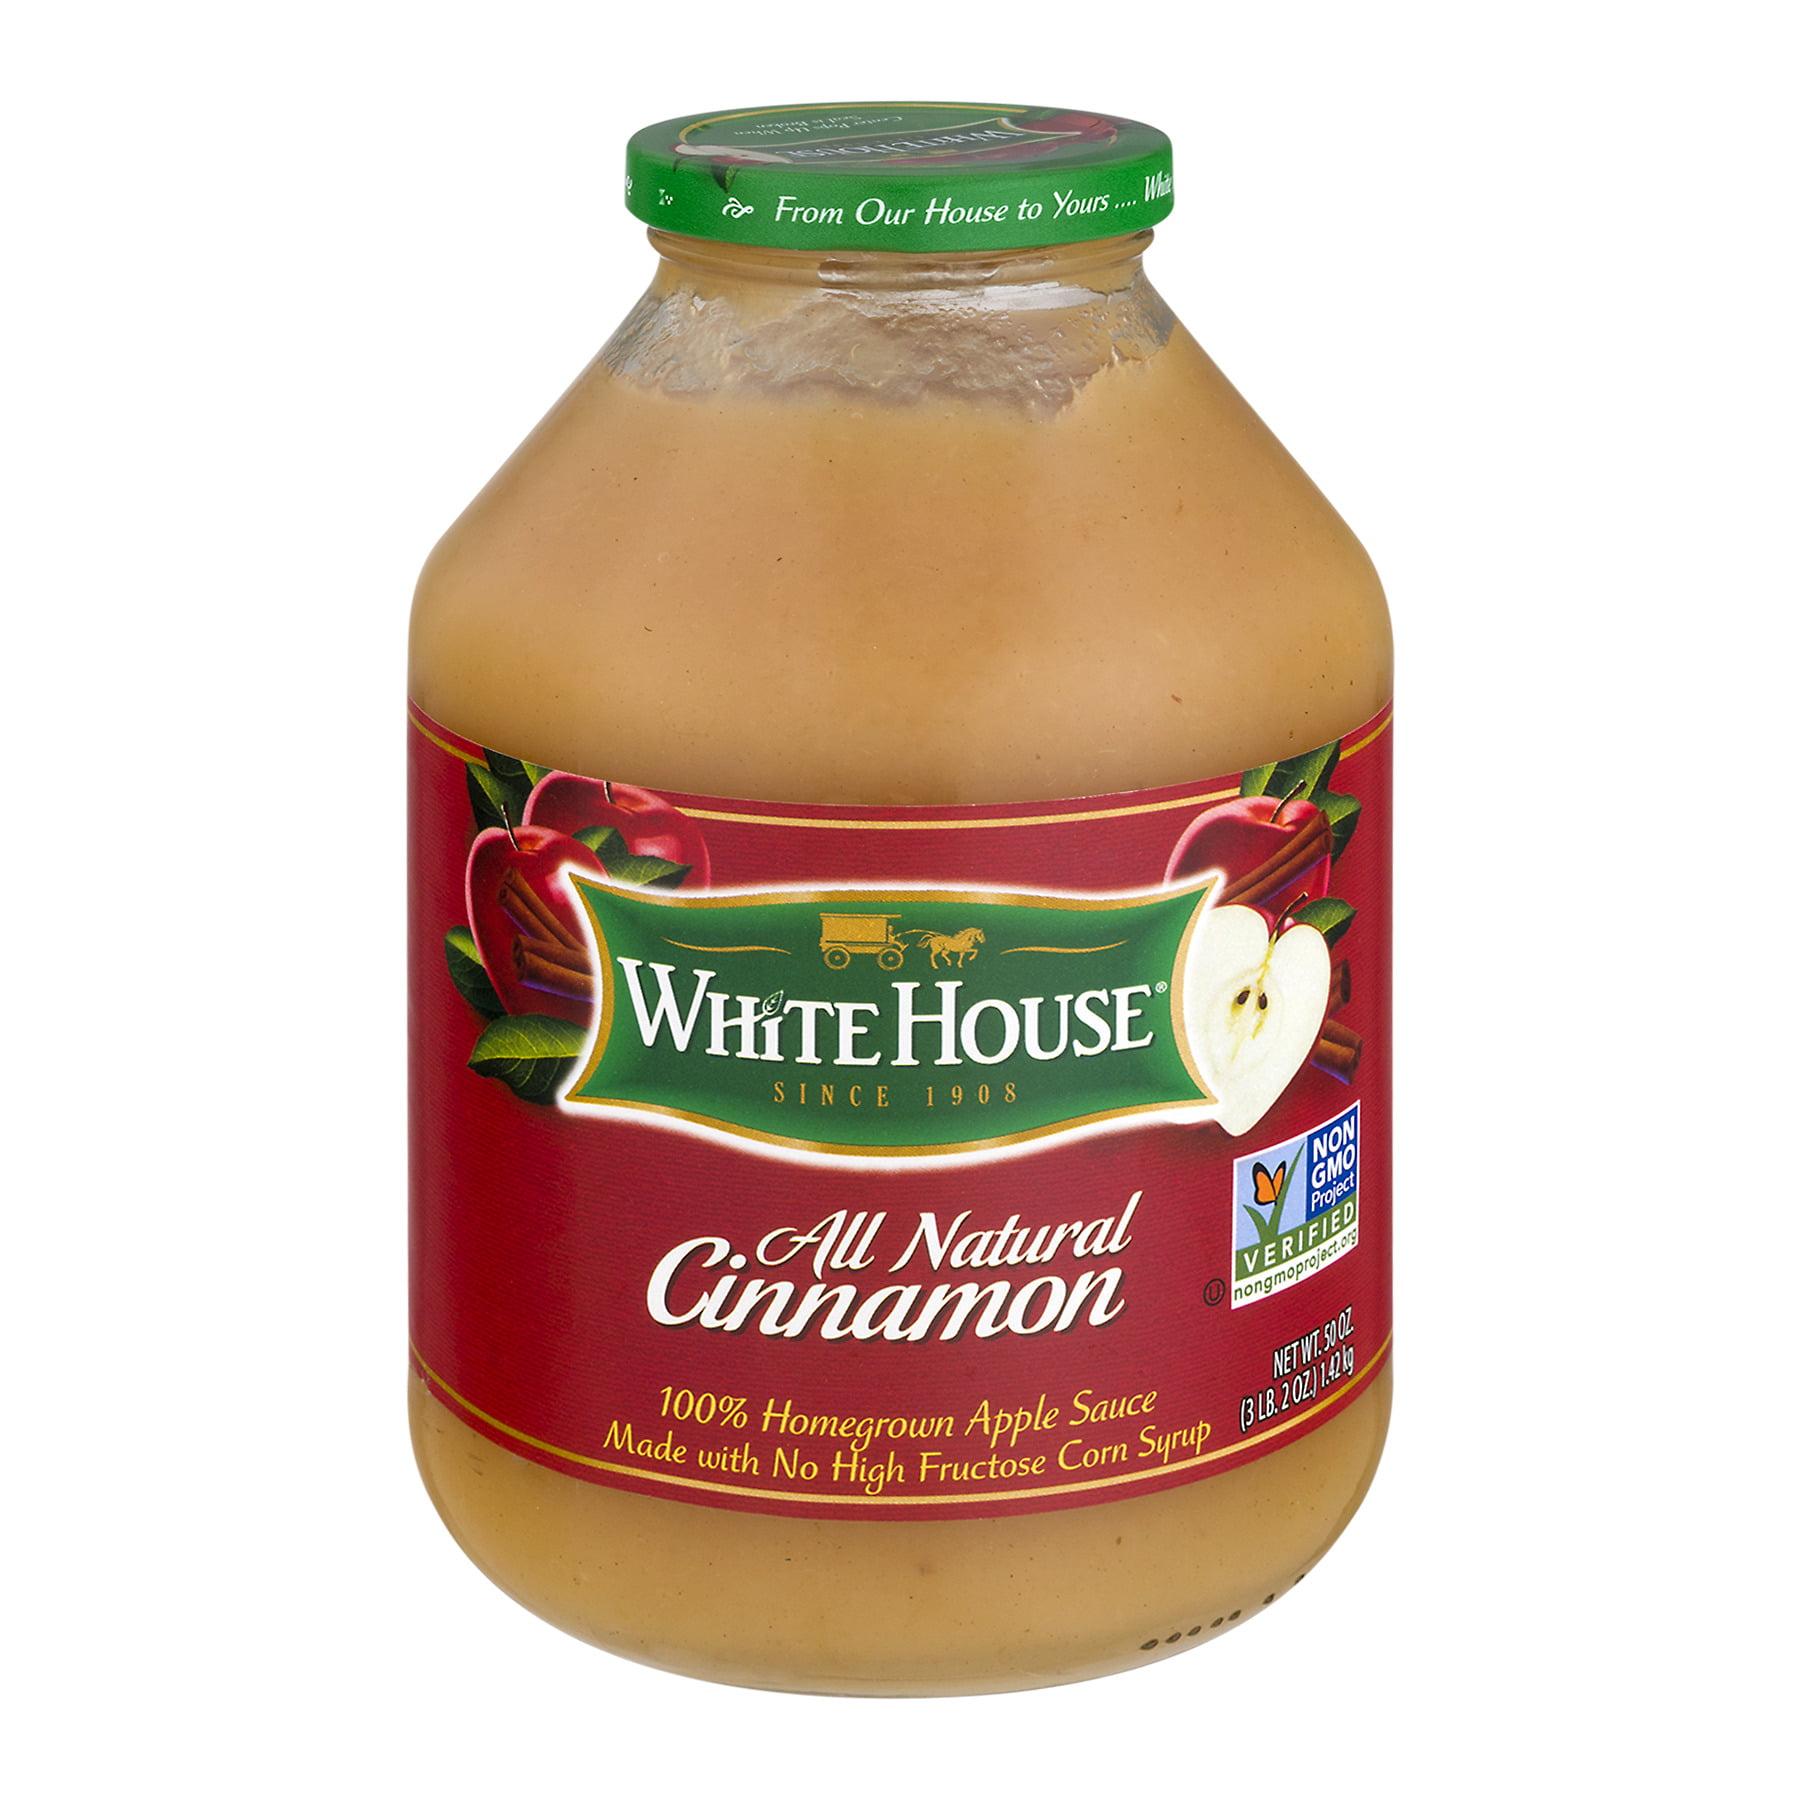 White House All Natural Apple Sauce Cinnamon, 50.0 OZ